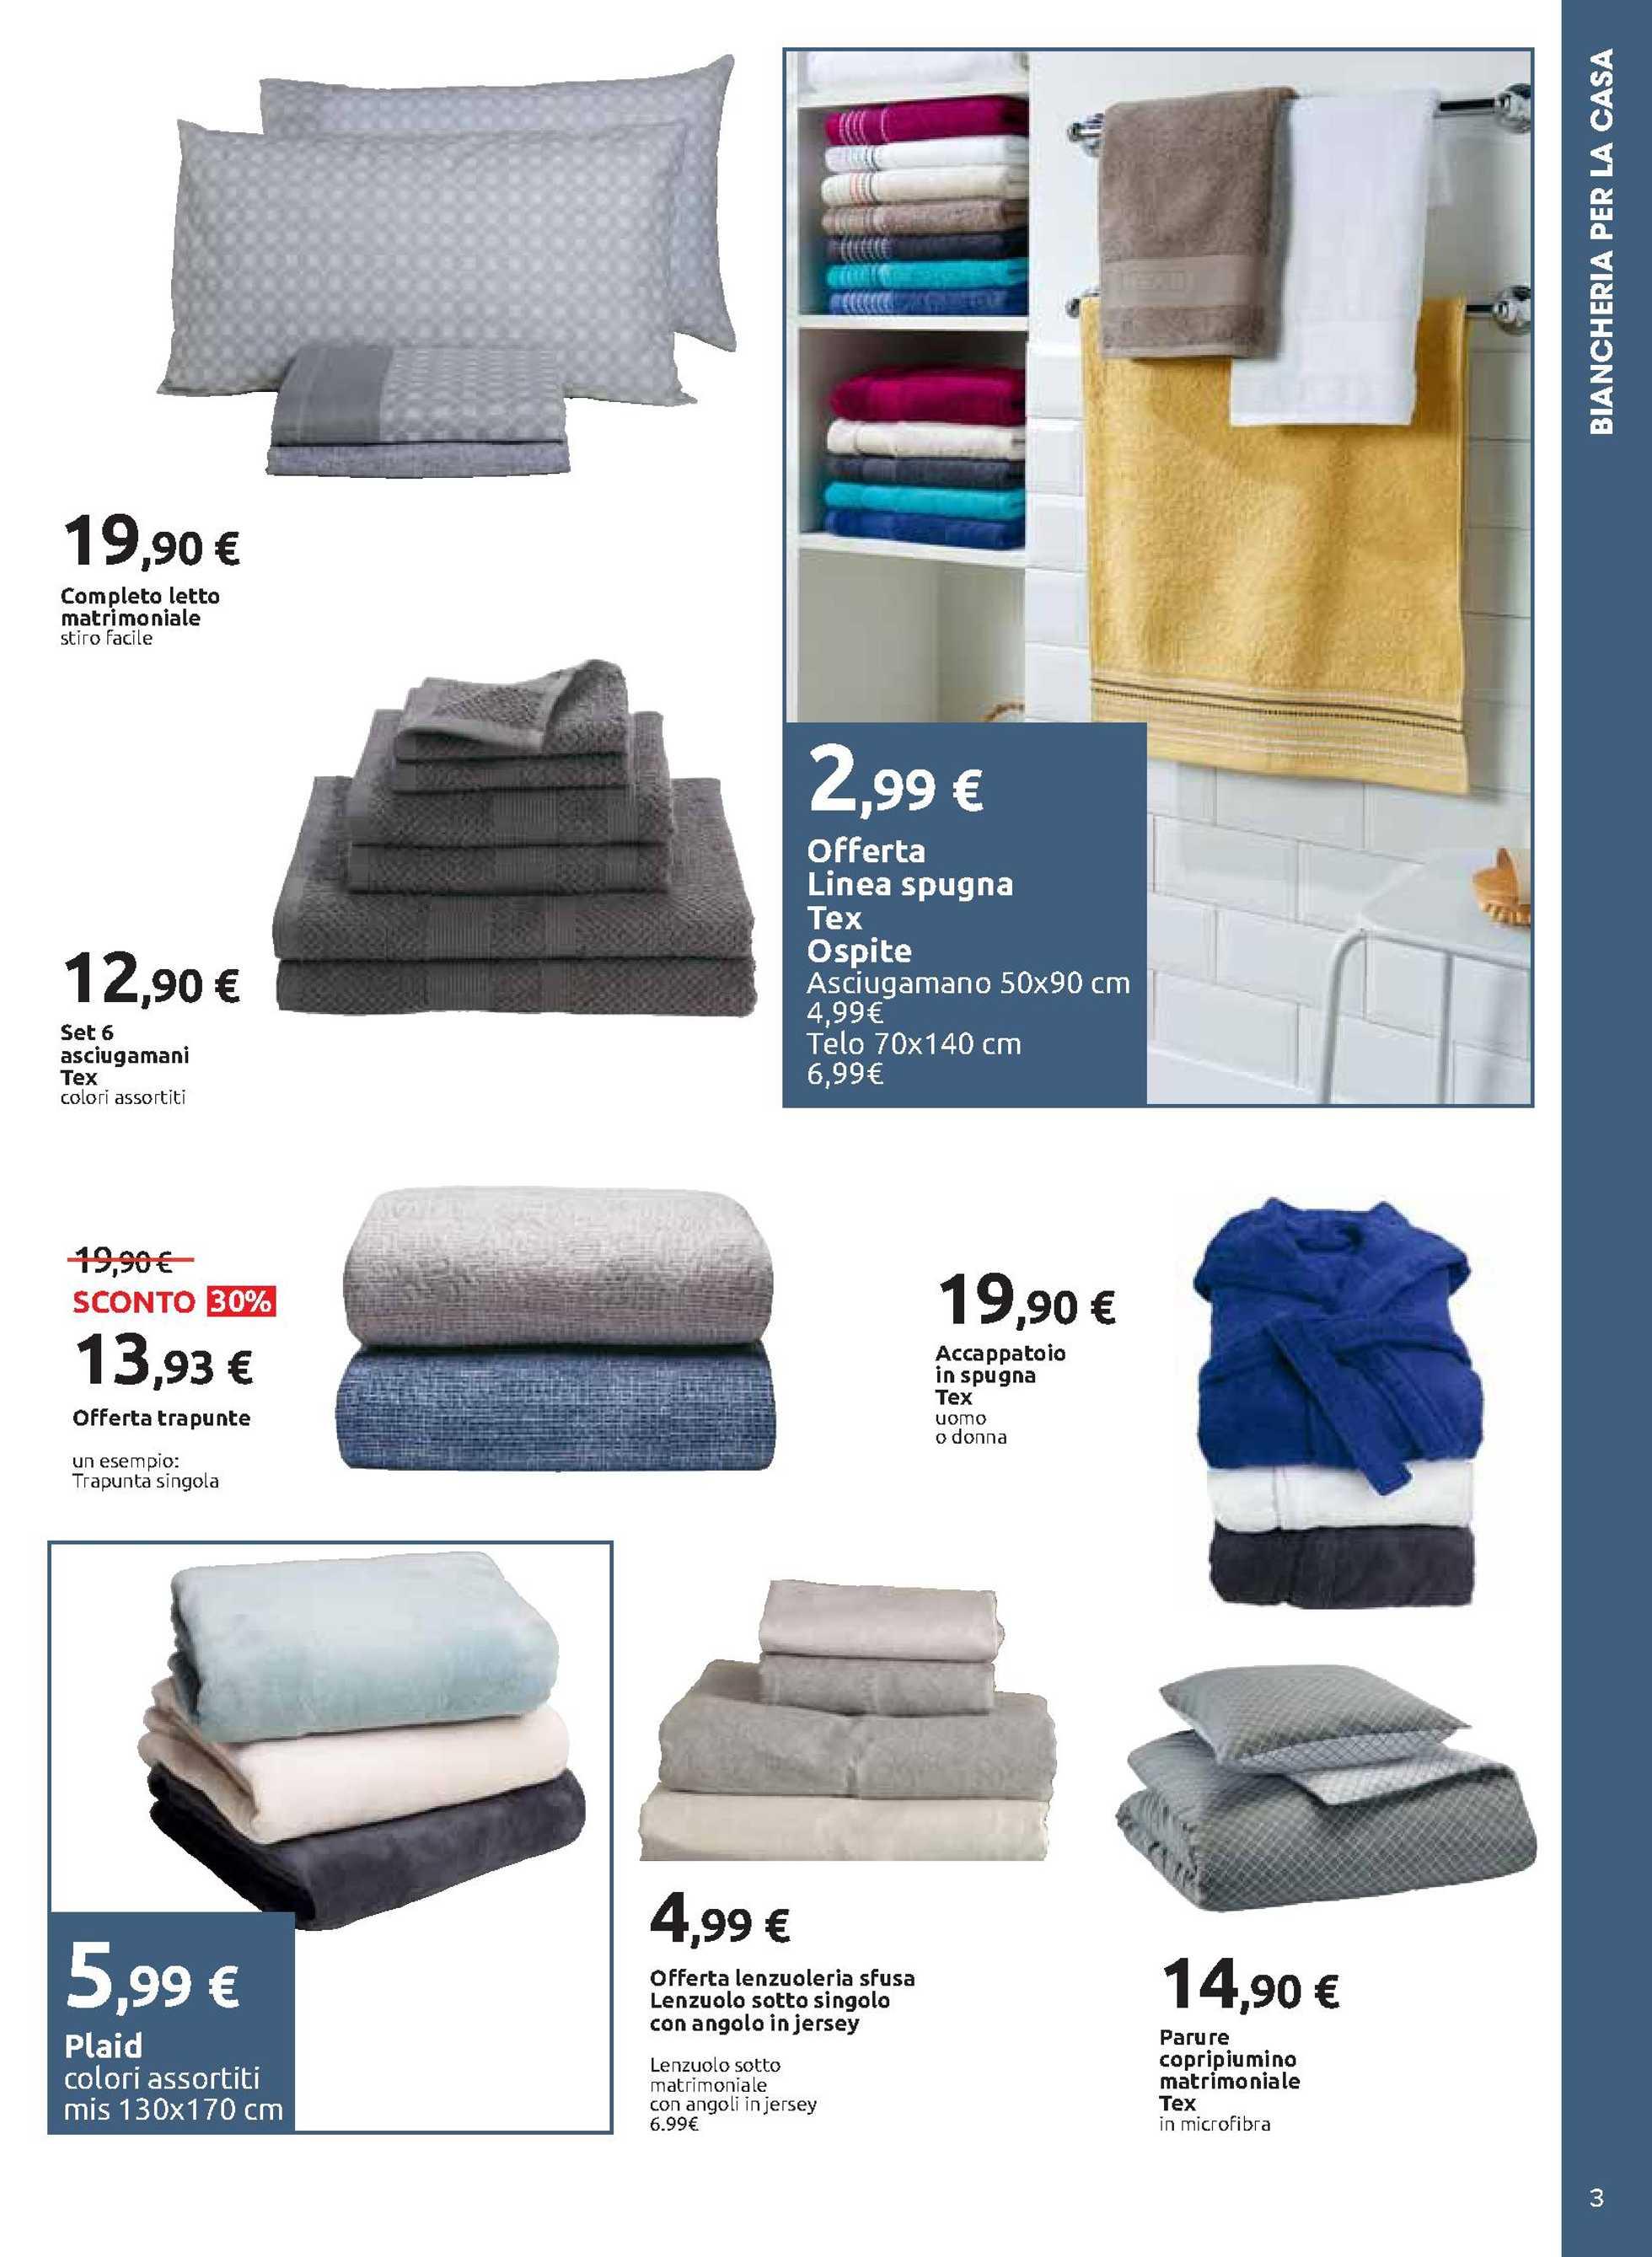 Carrefour Iper - offerte valide dal 02.09.2020 al 24.09.2020 - pagina 3.